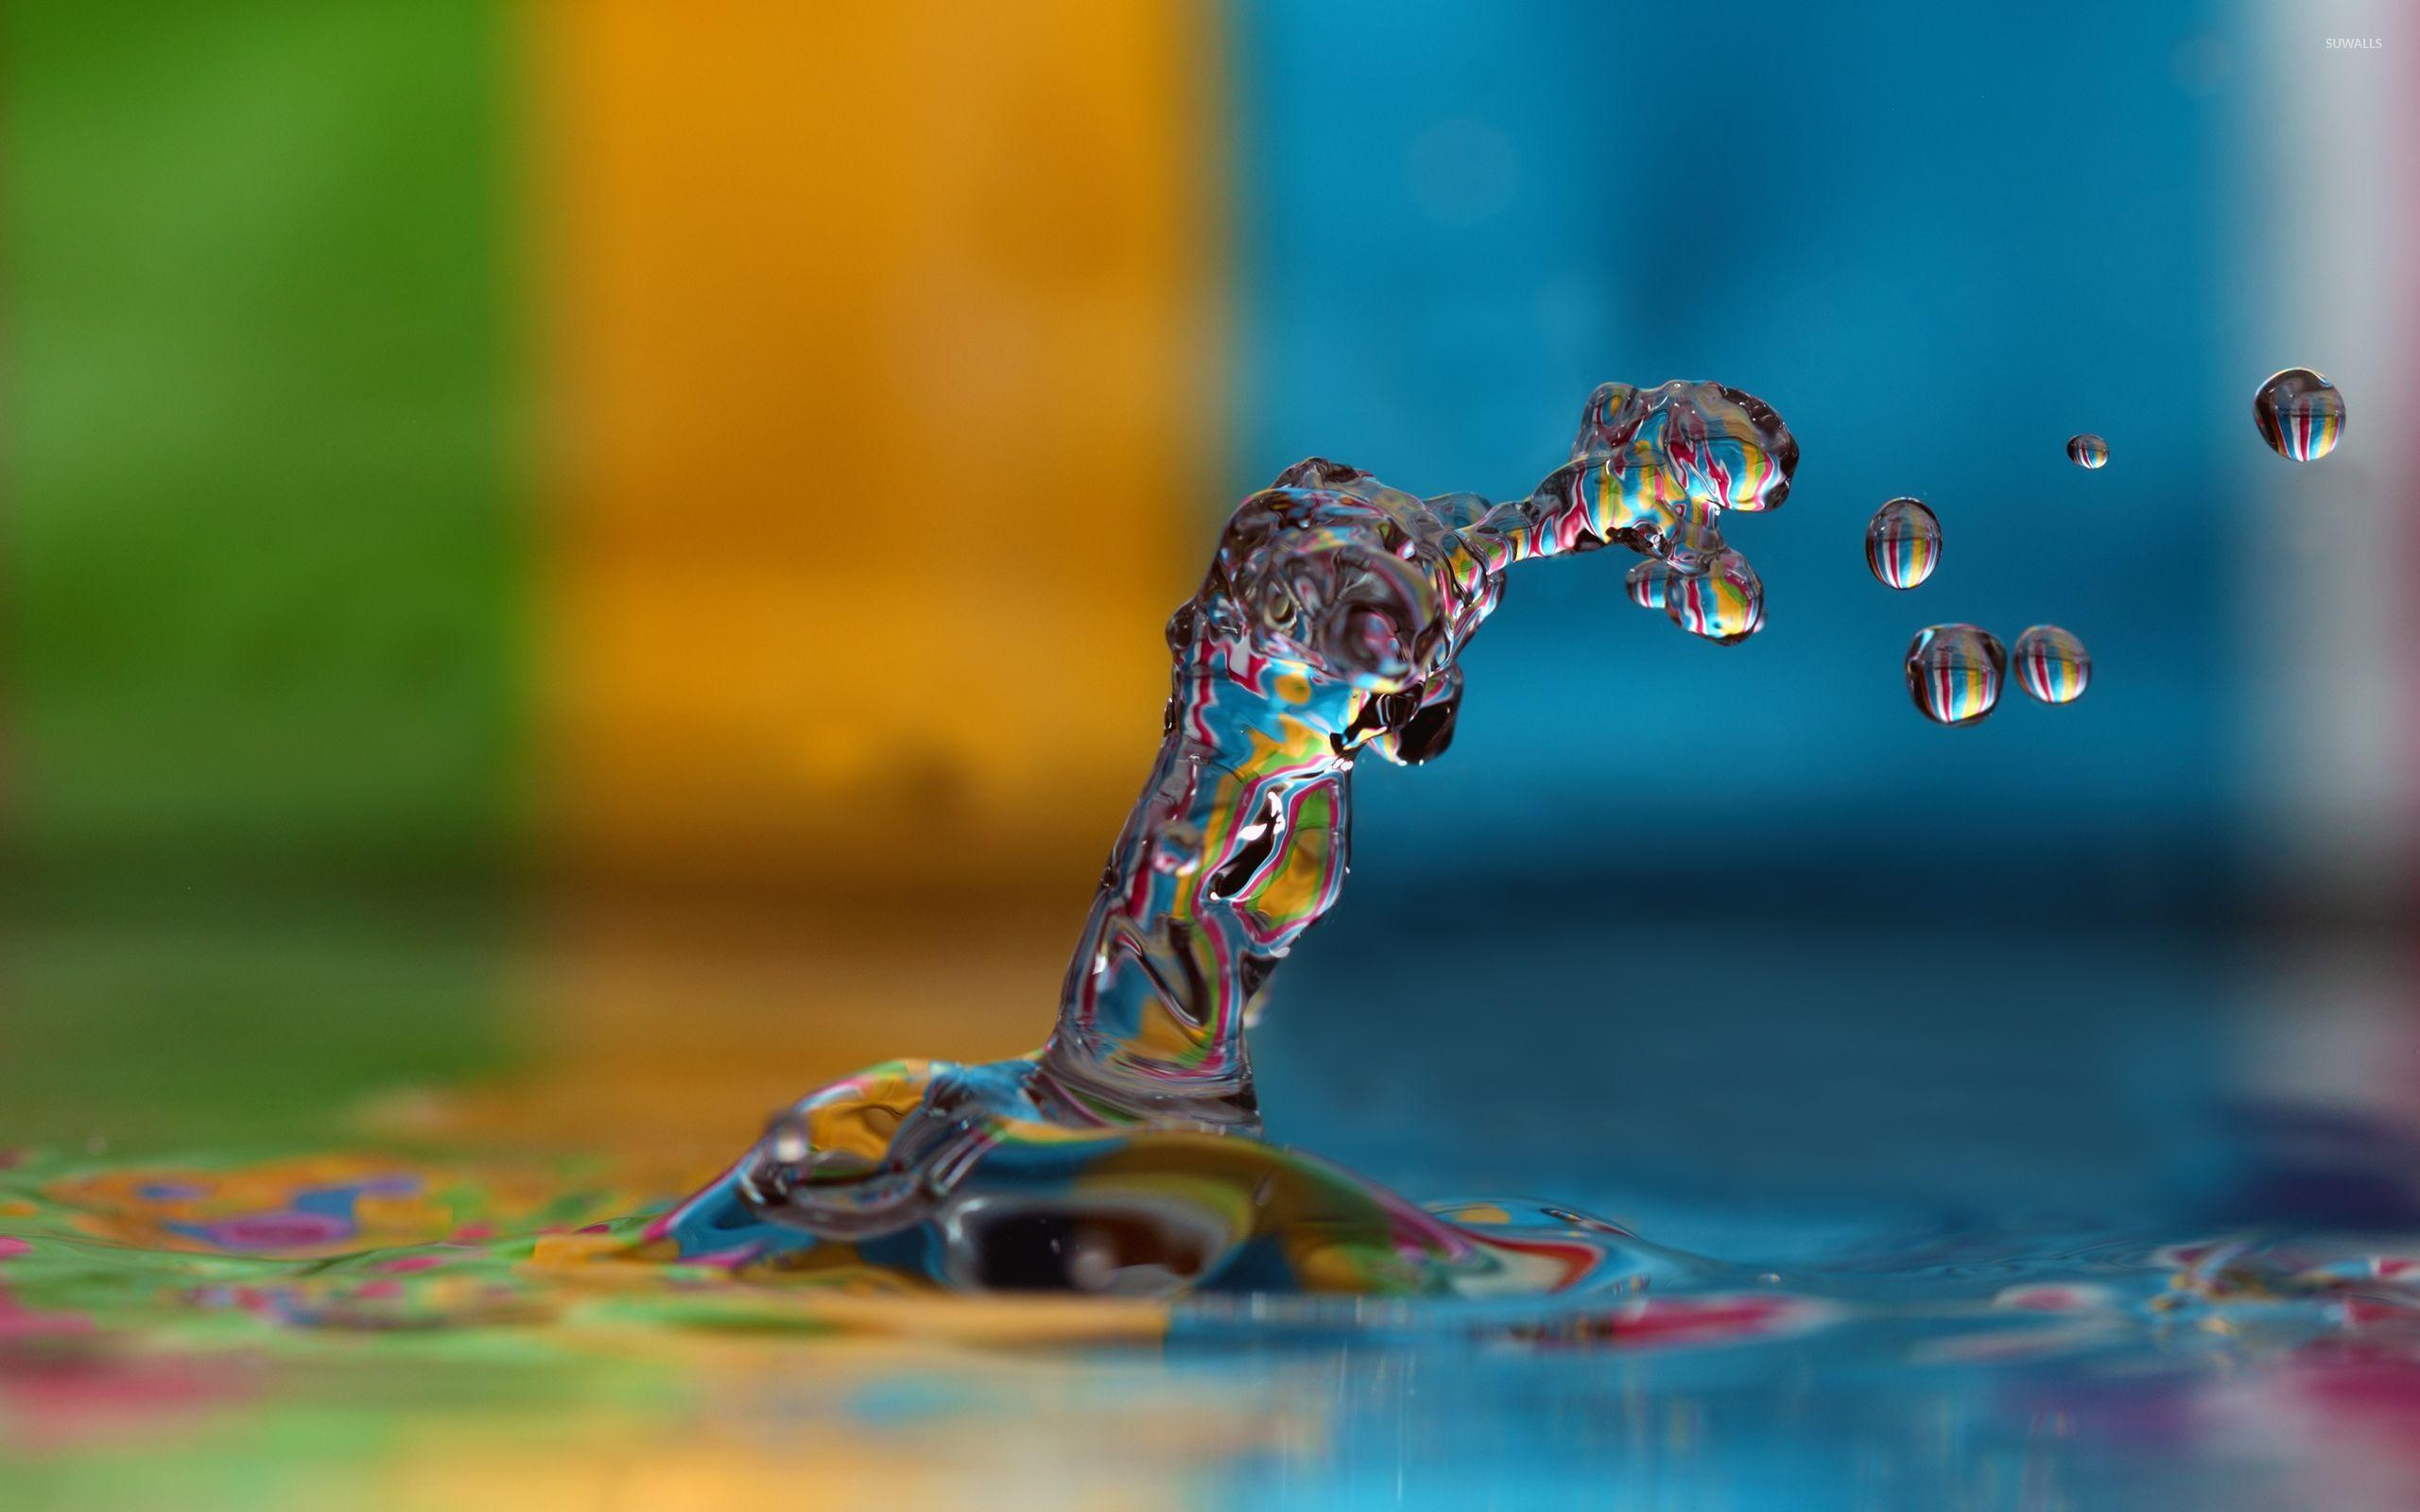 Digital art lots of water drops on the wall